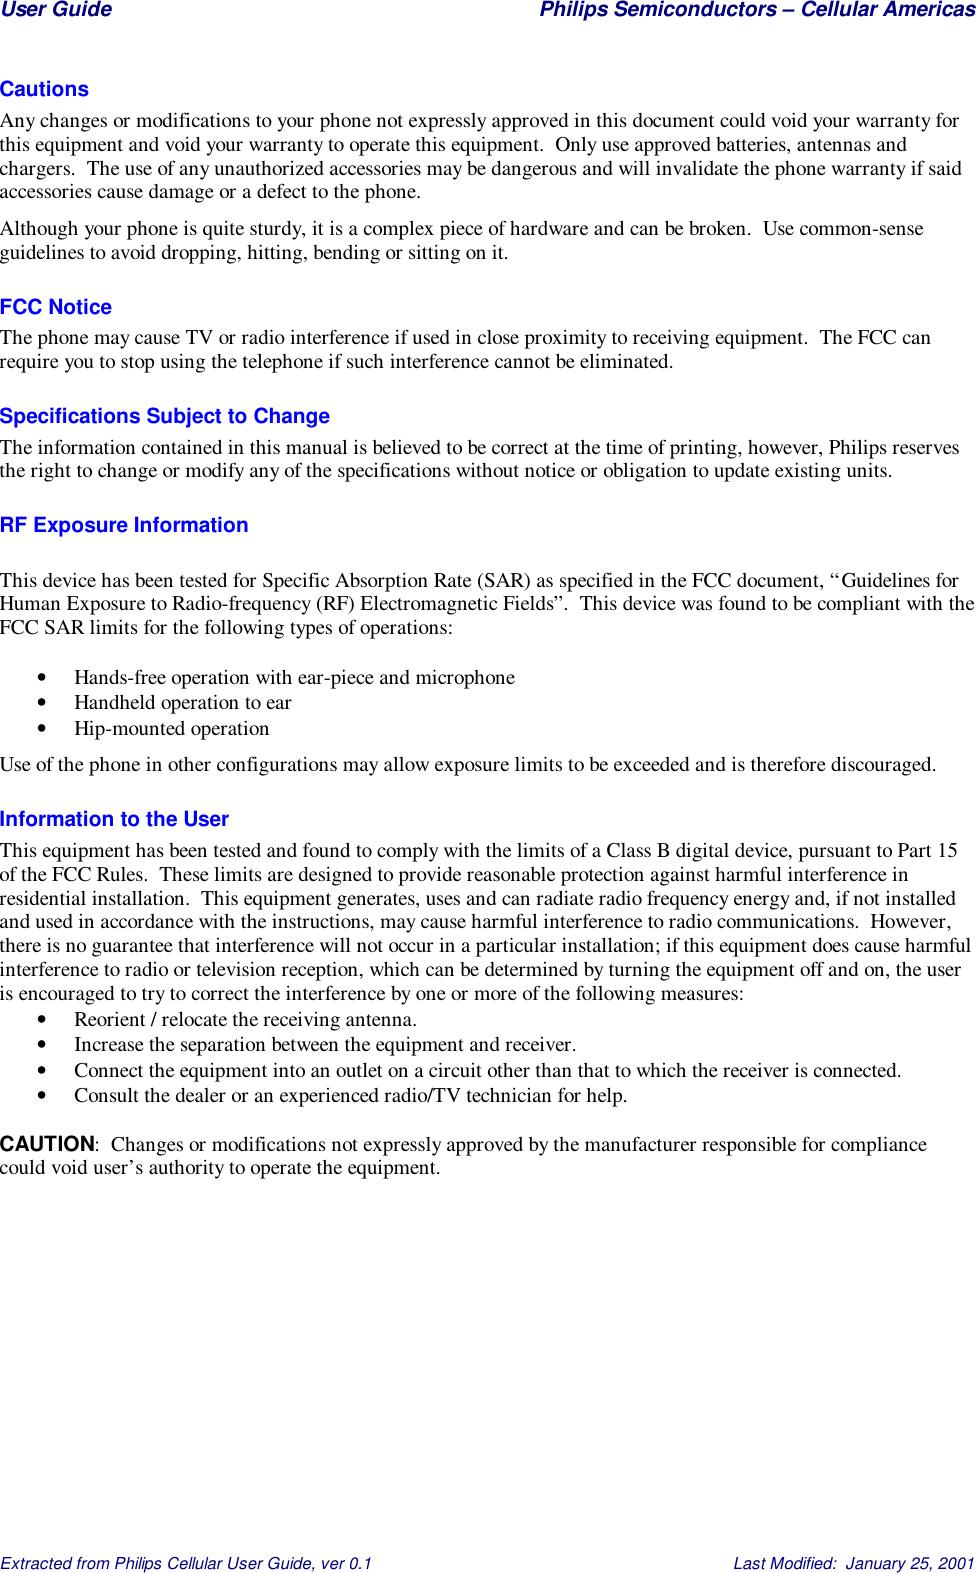 Philips Cellular Americas R and D HHP CDMA Handset User